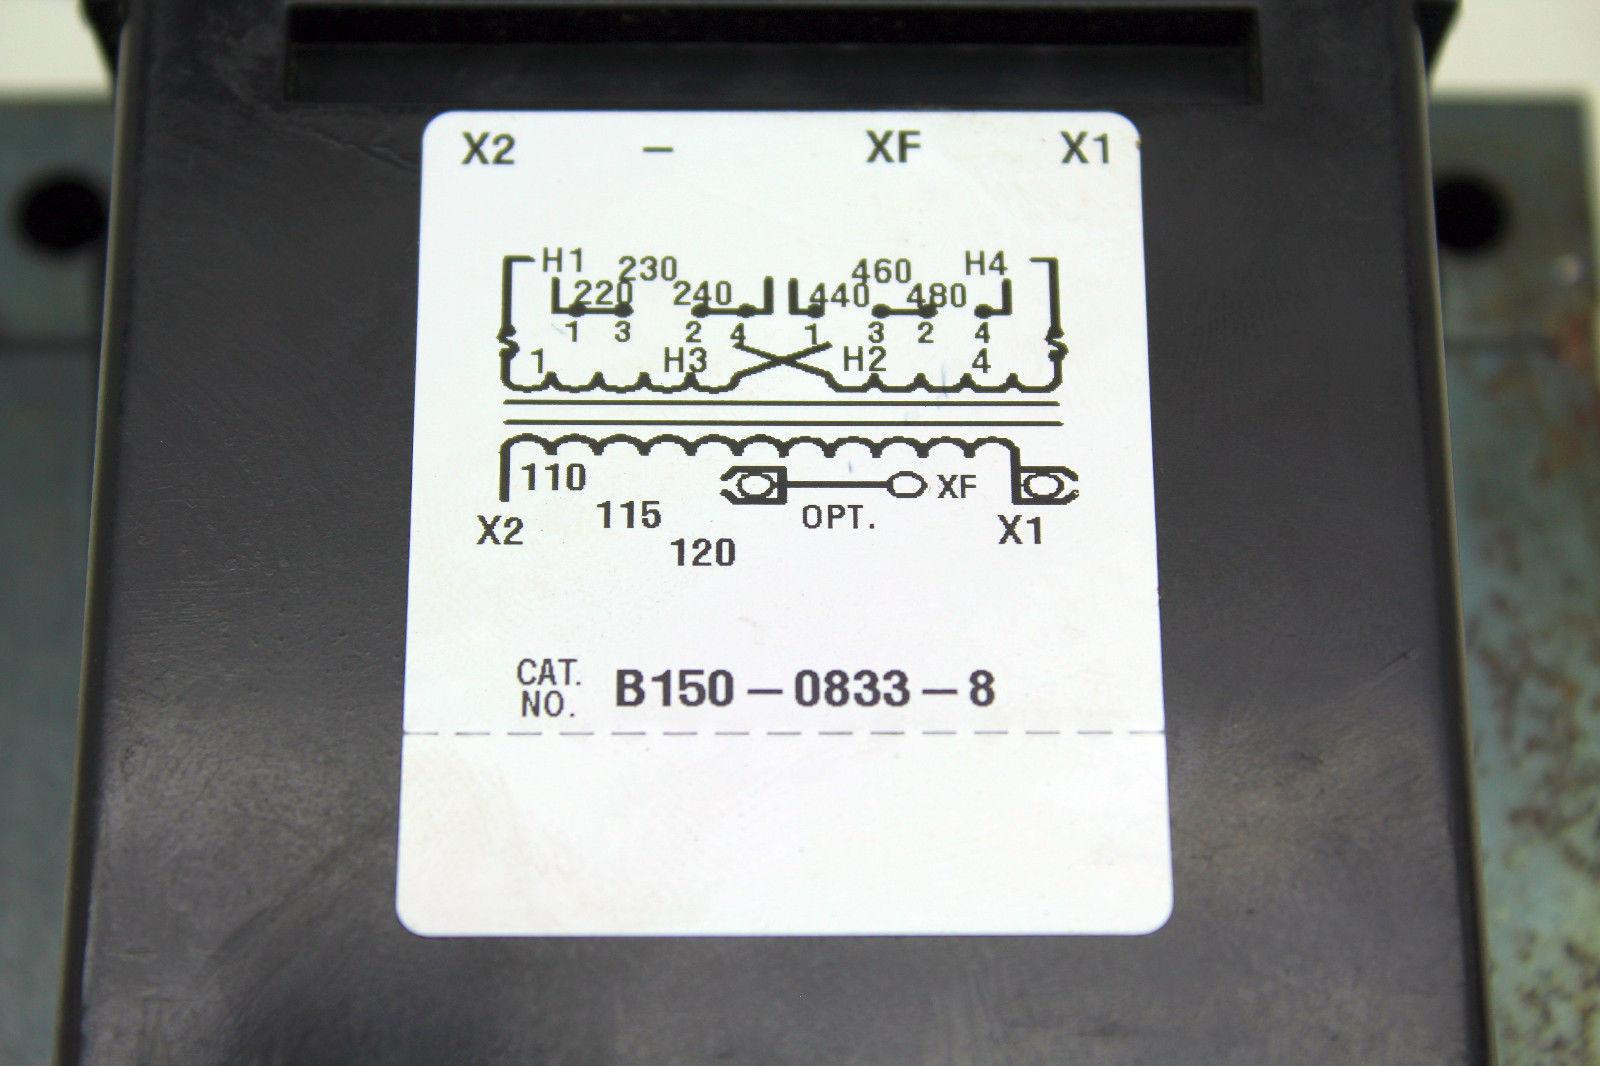 3 9?fit=1600%2C1066&ssl=1 micron impervitran b150 0833 8 050kva temp 105 control transformer micron control transformer wiring diagram at webbmarketing.co